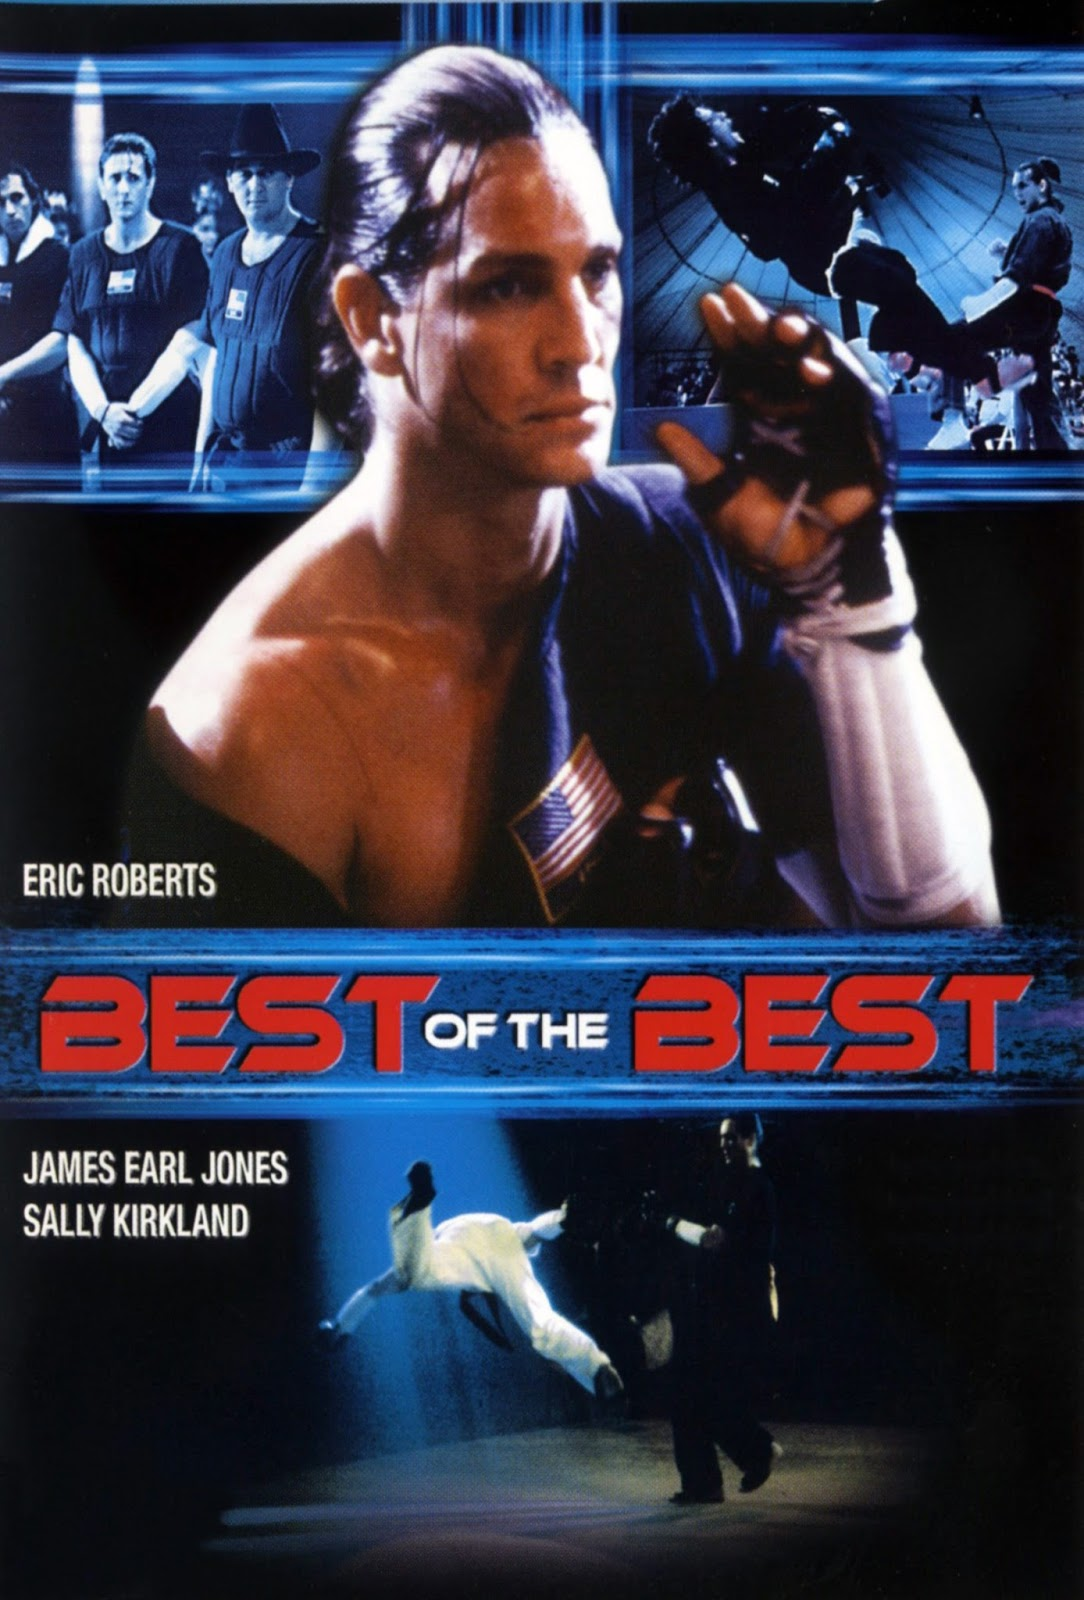 Best of the Best 1989 - Full (HD)